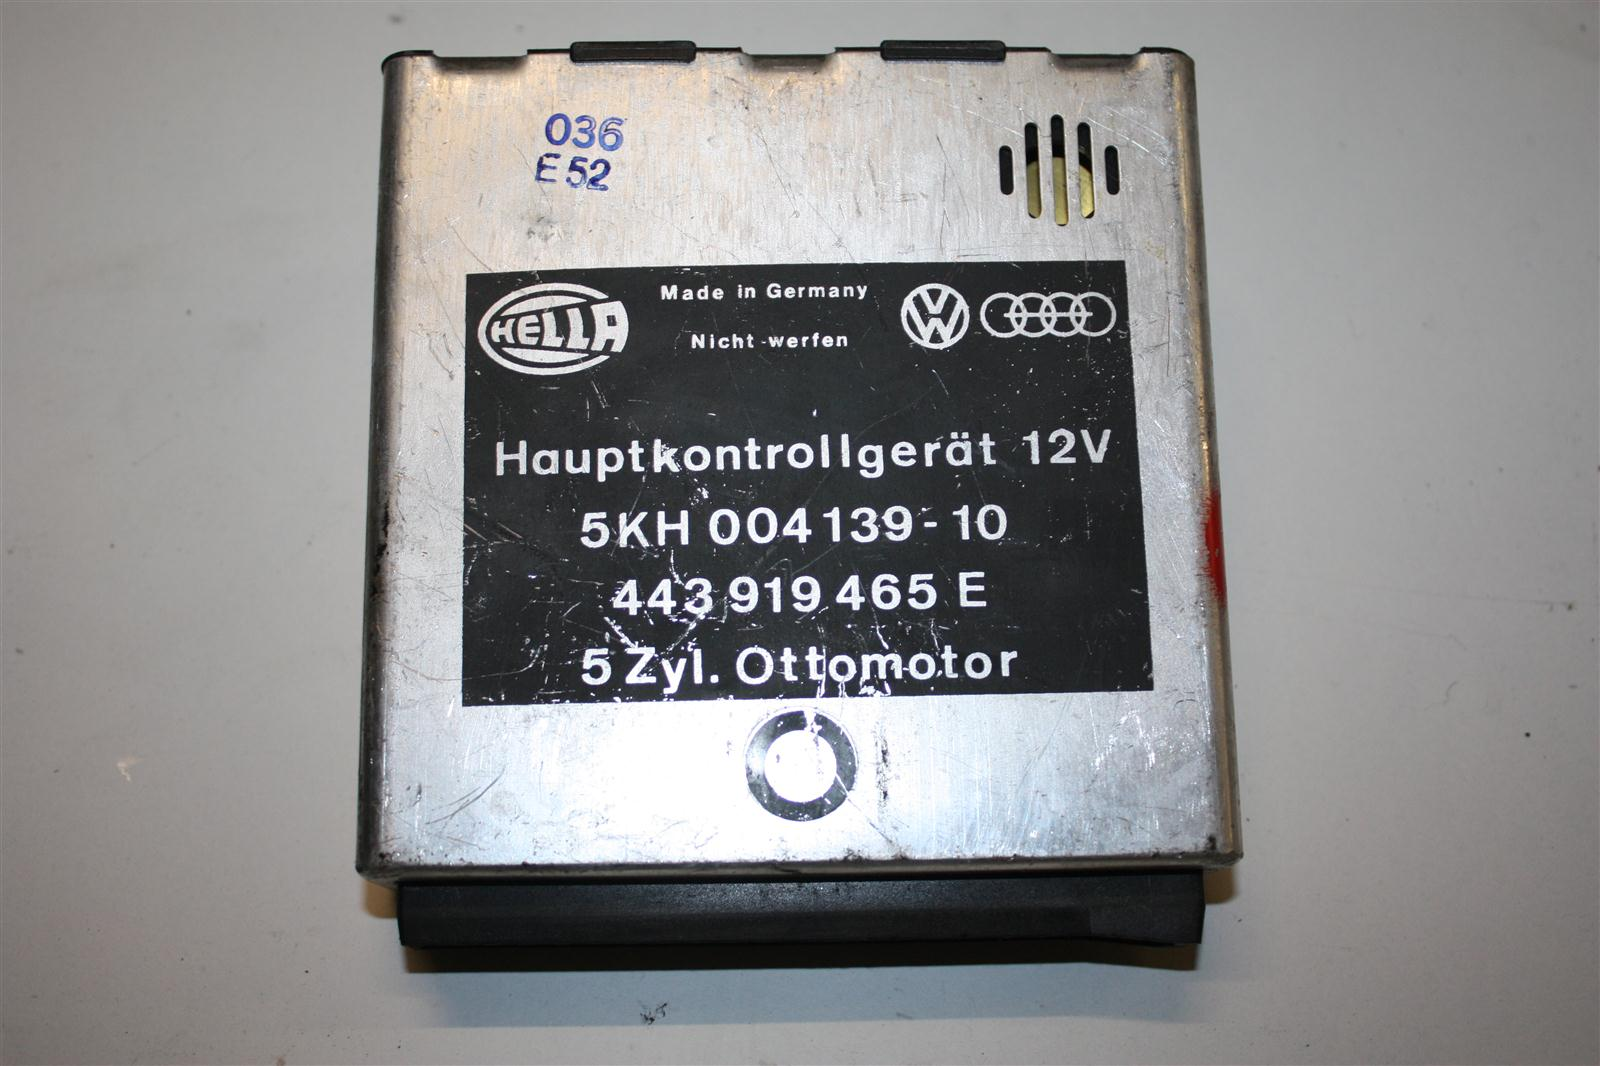 Audi/VW 100/200 Typ 44 Hauptkontrollgerät Checkpaket 443919465E